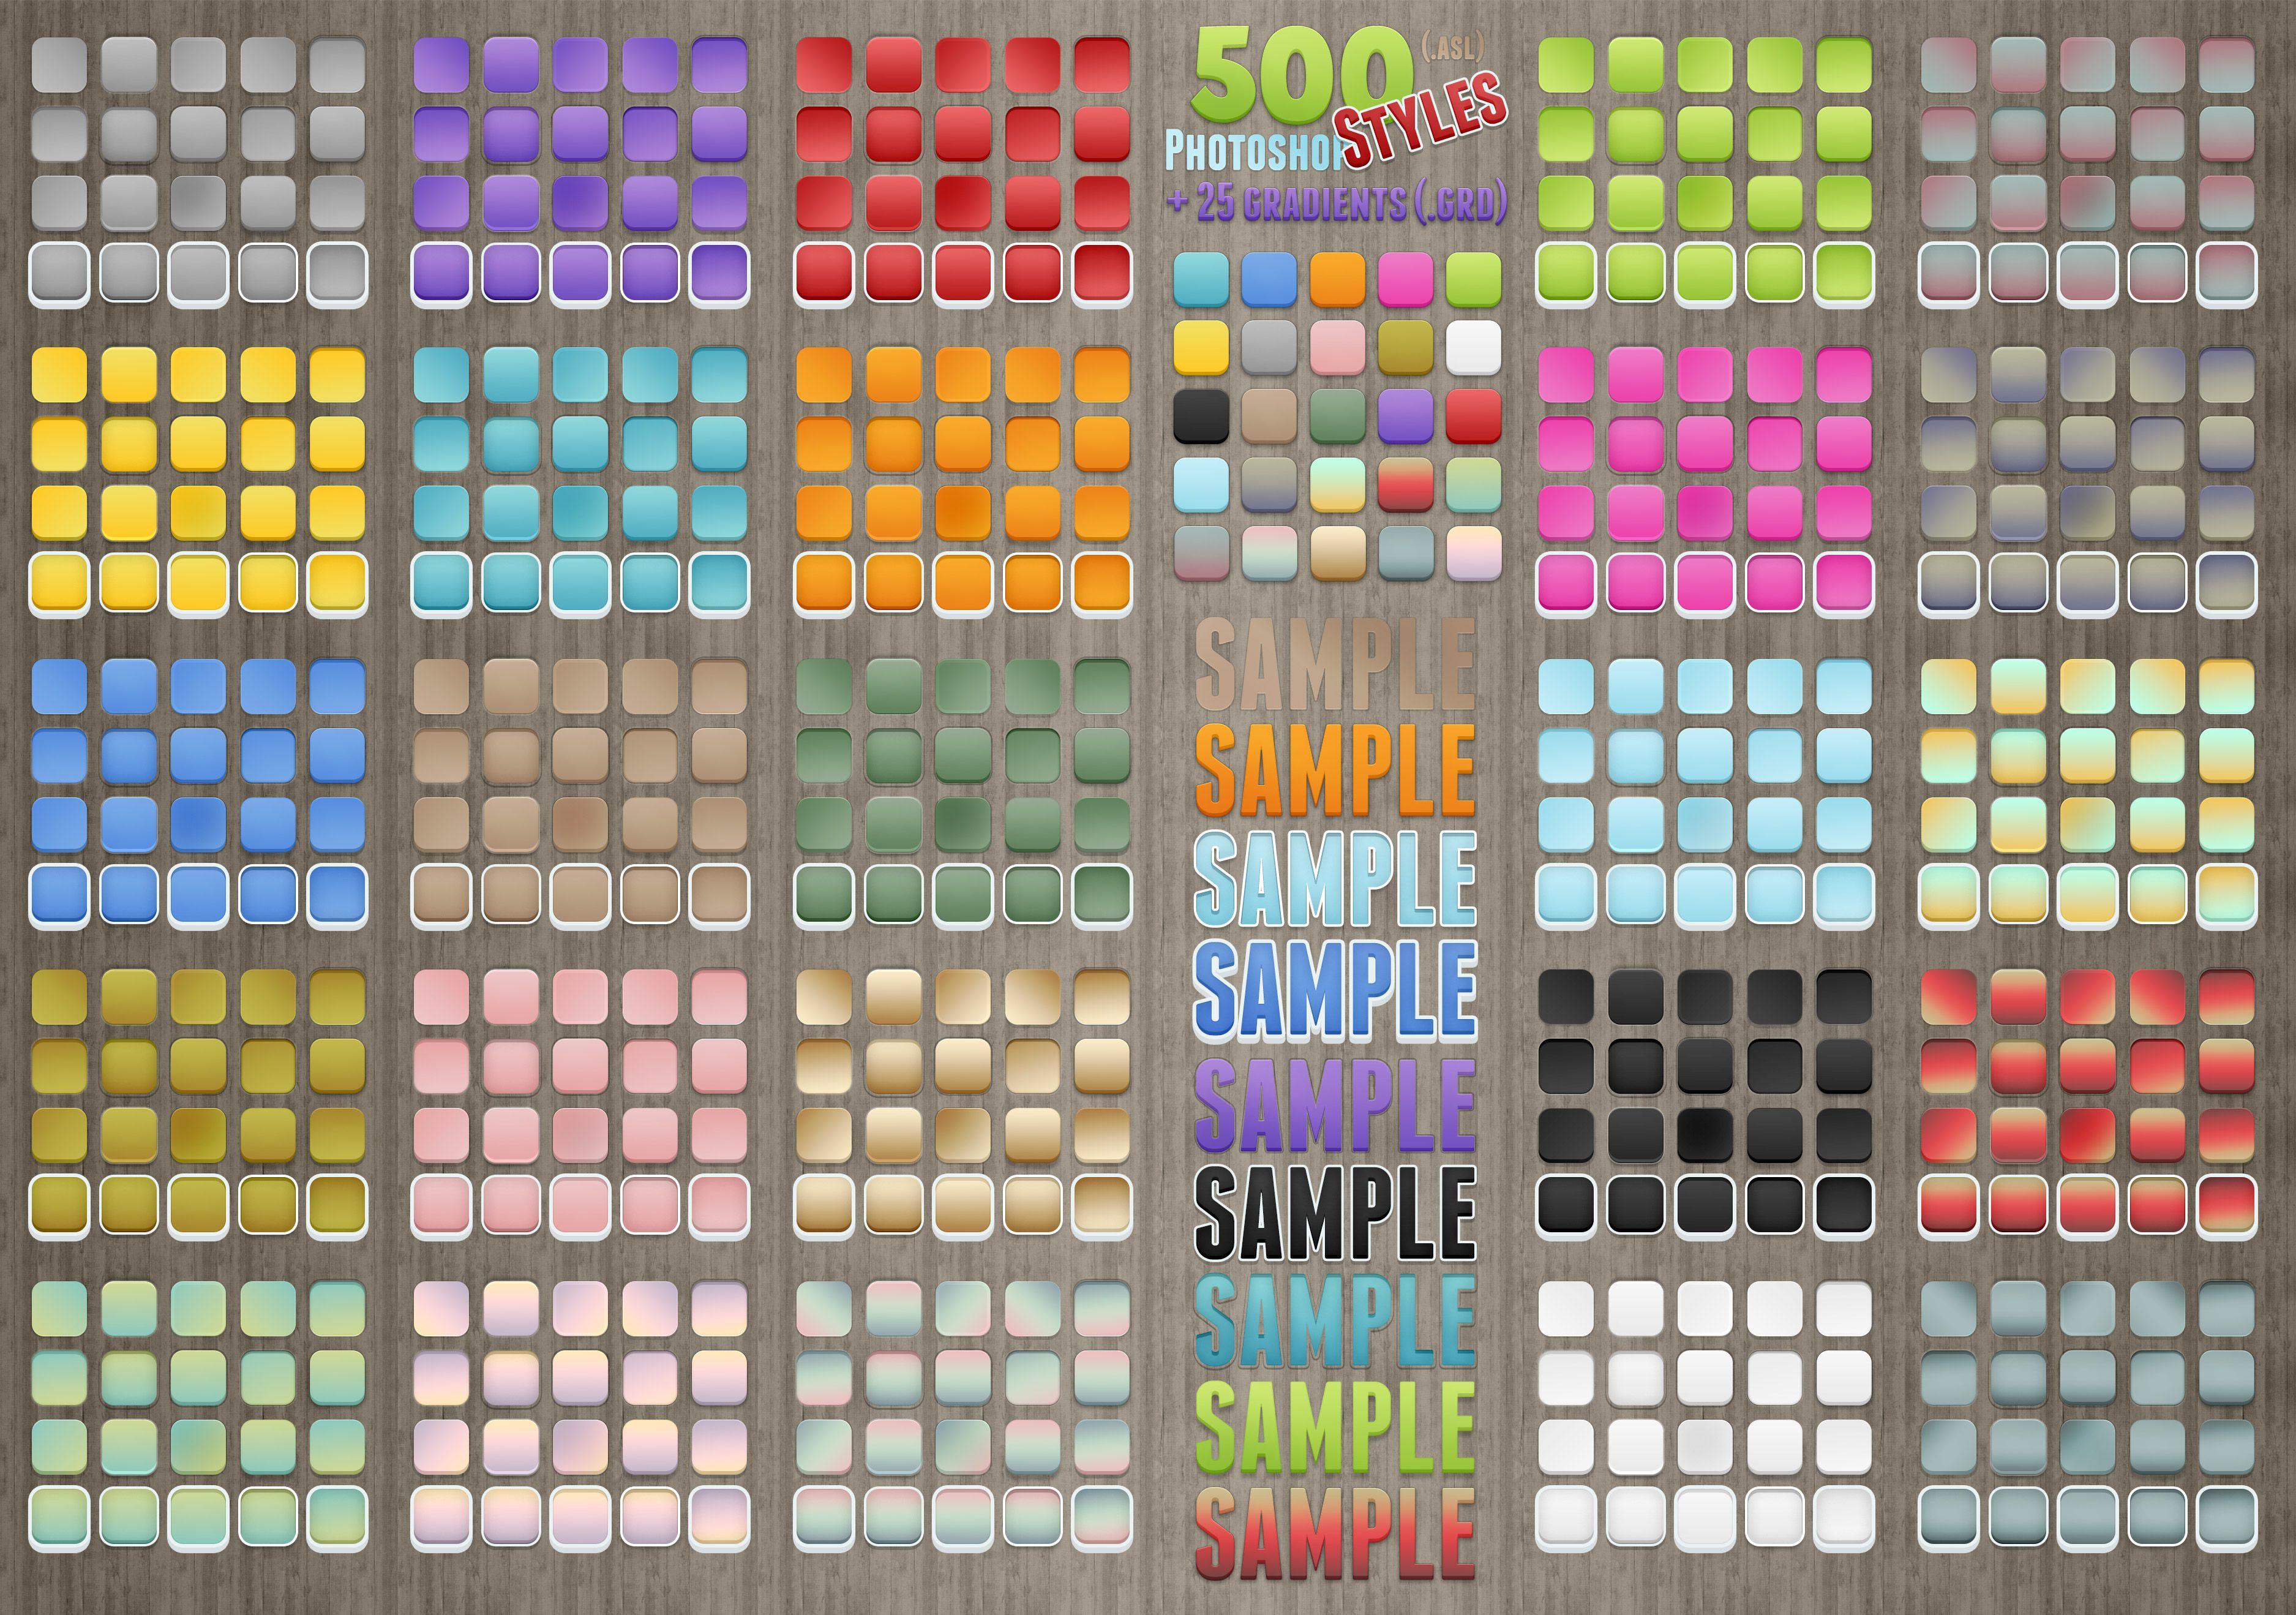 Download 500 Photoshop Styles by survivorcz   Photoshop styles ...